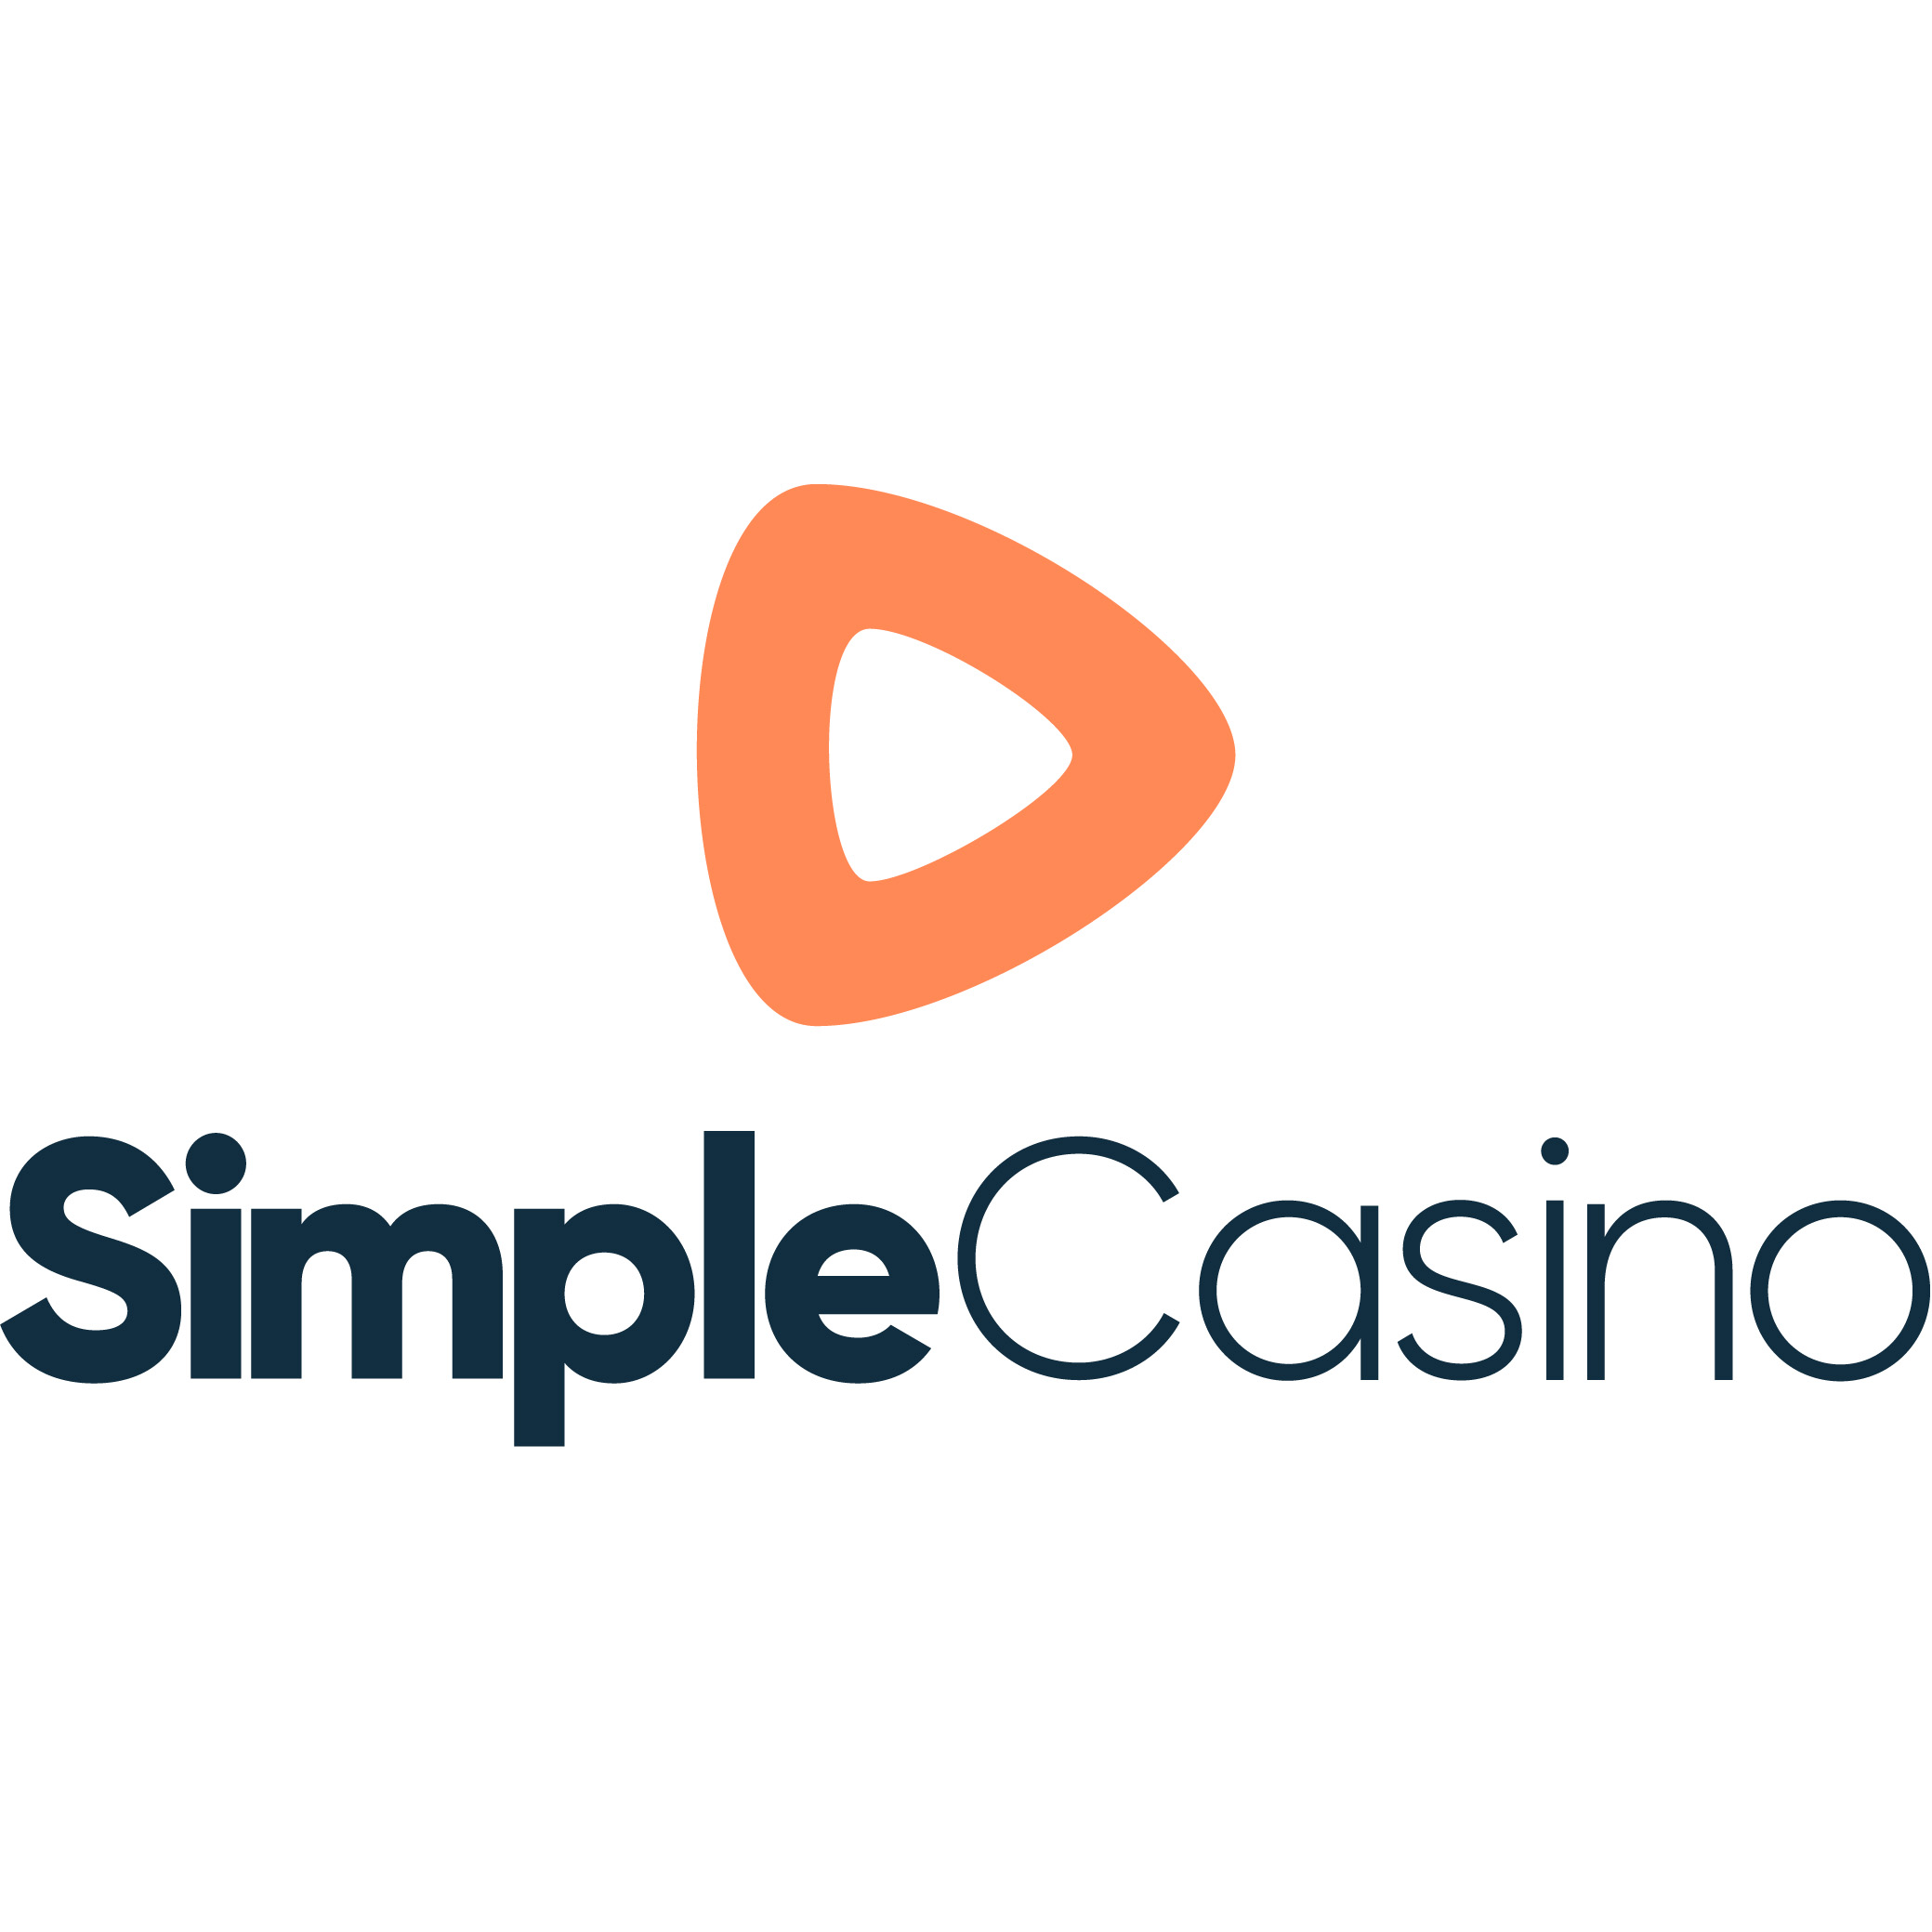 New Brand: Simple Casino